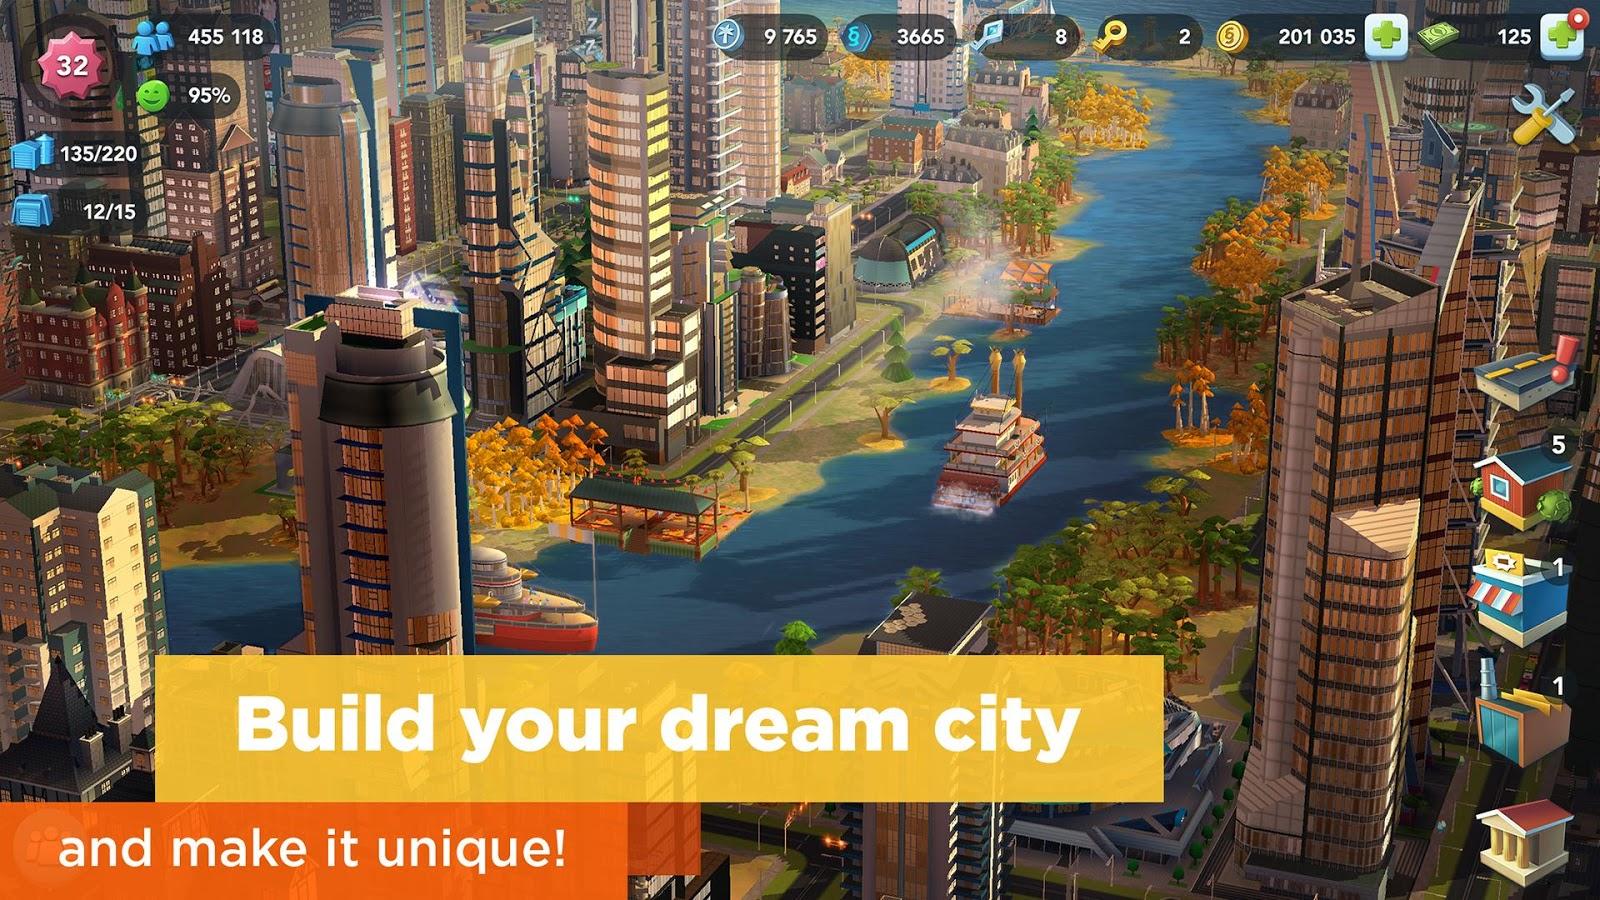 Modded Theme Park Tycoon 2